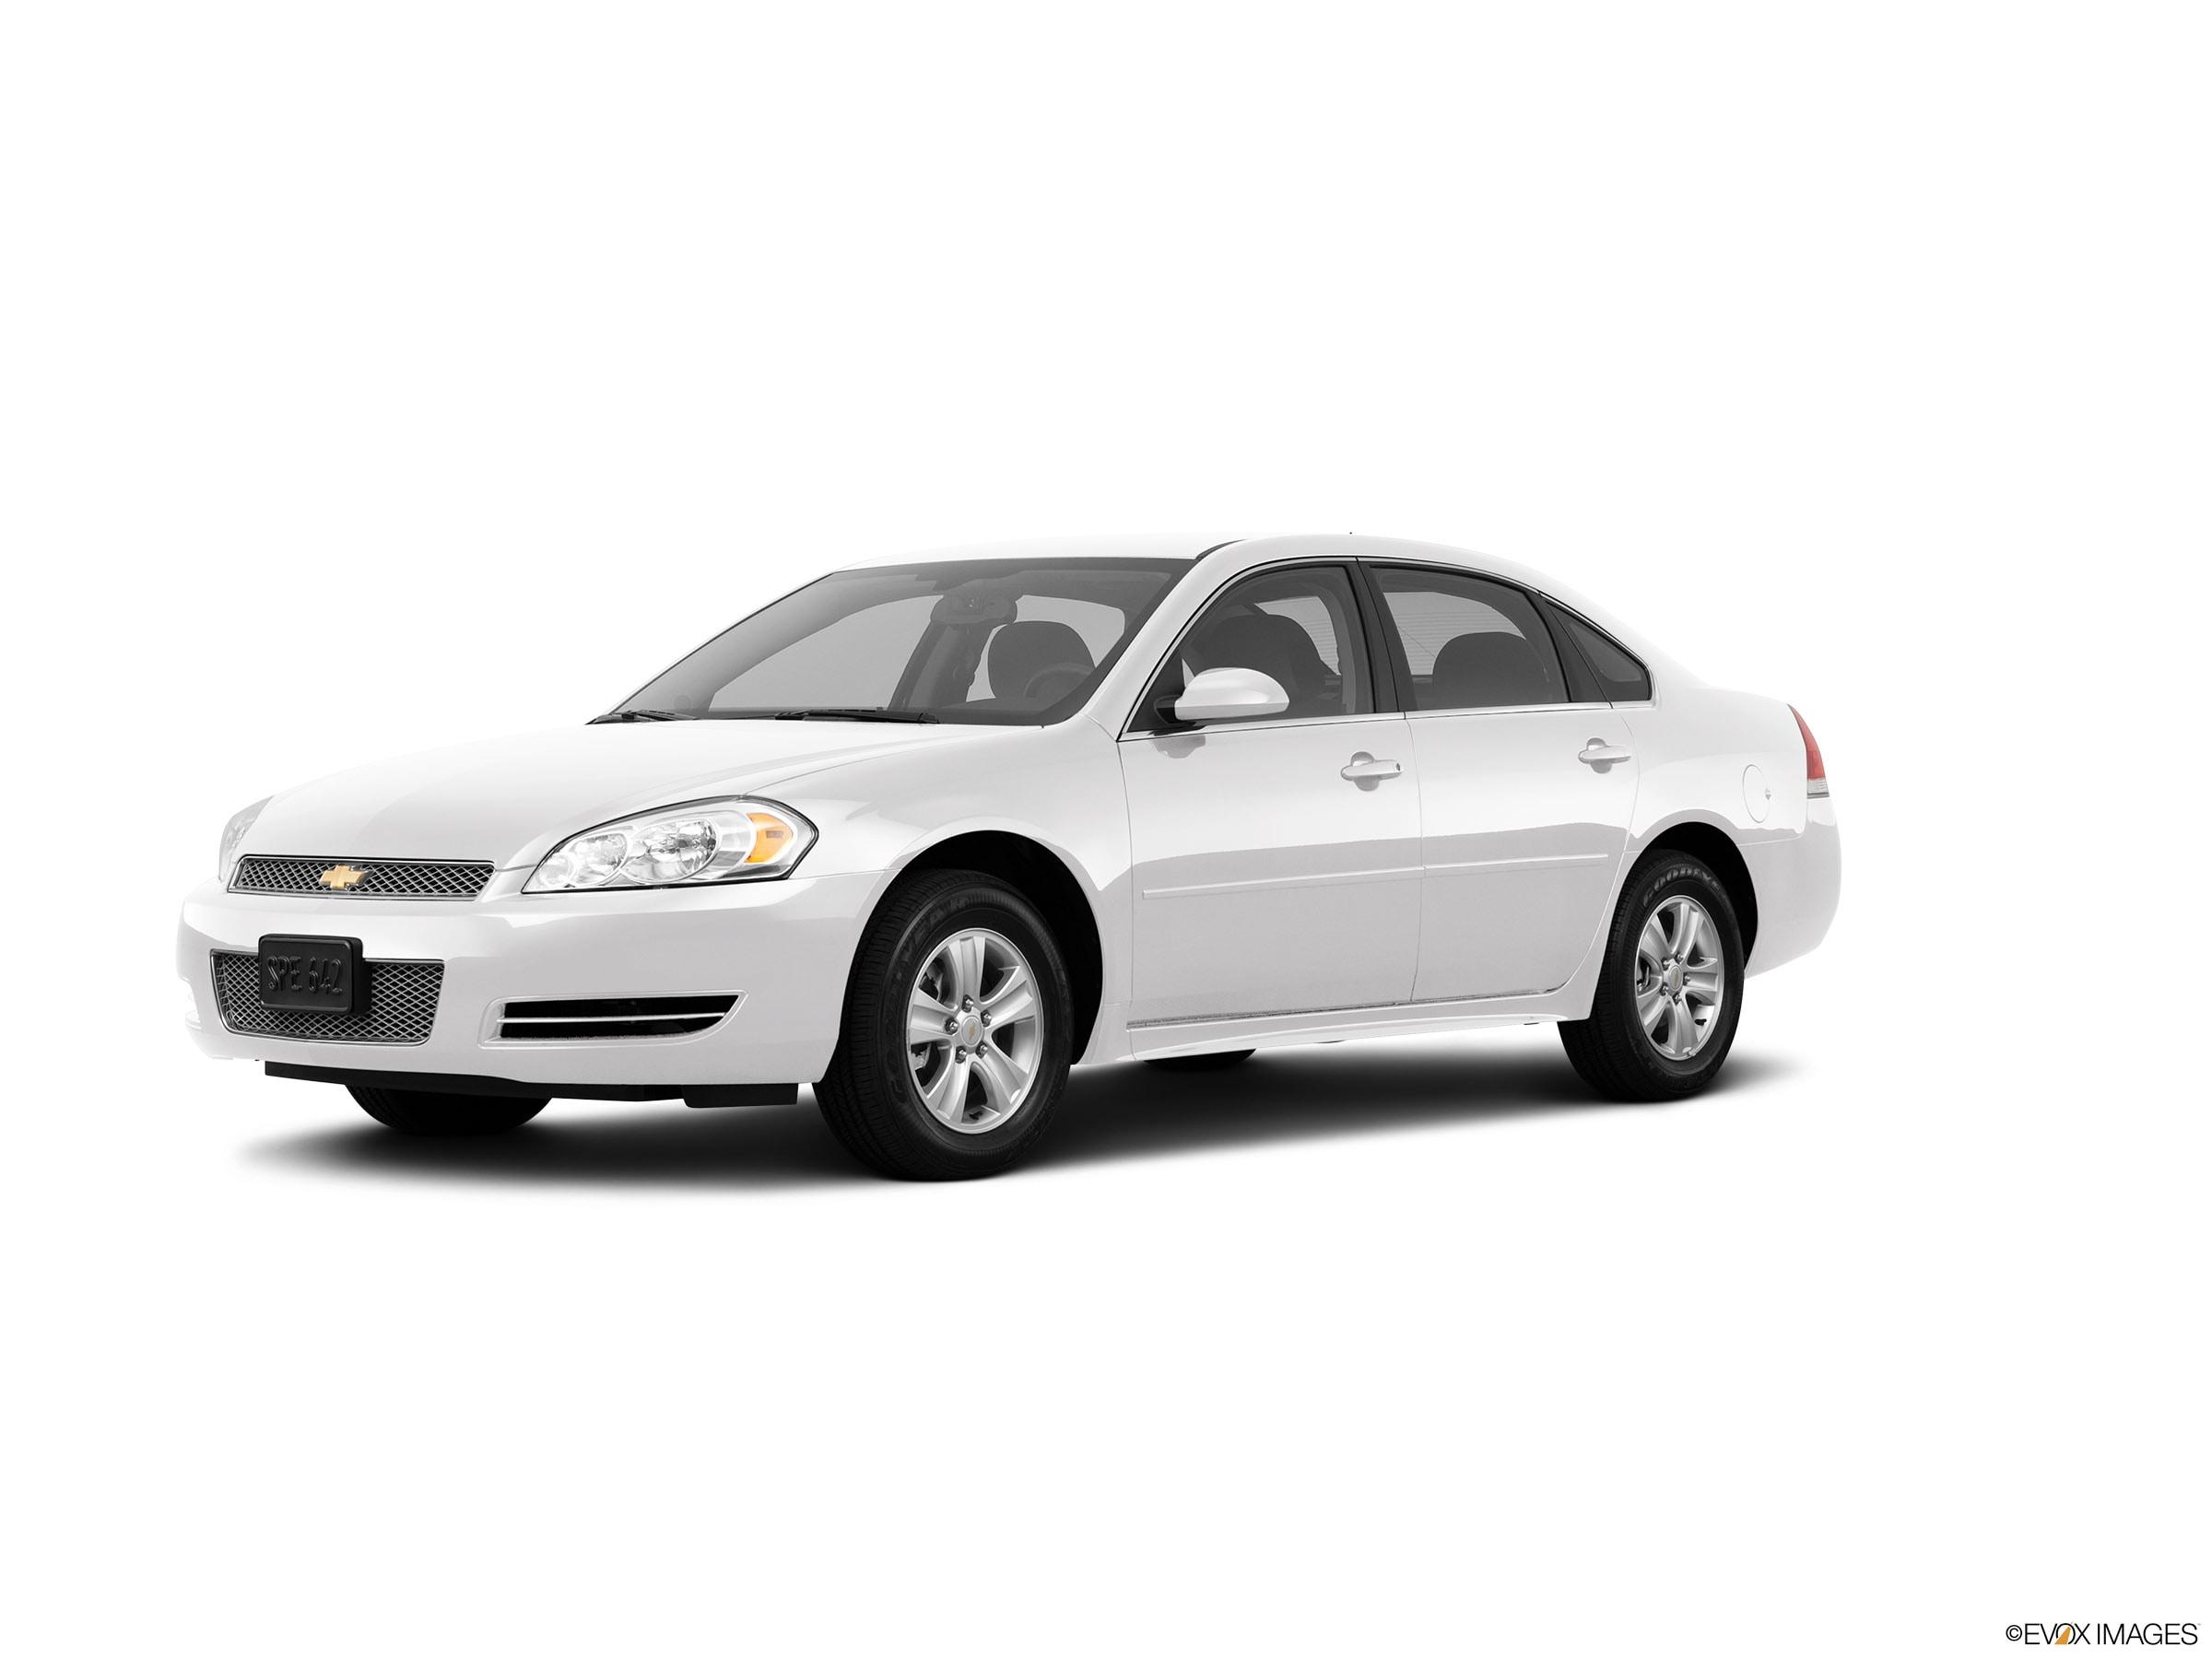 2013 Chevrolet Impala Car